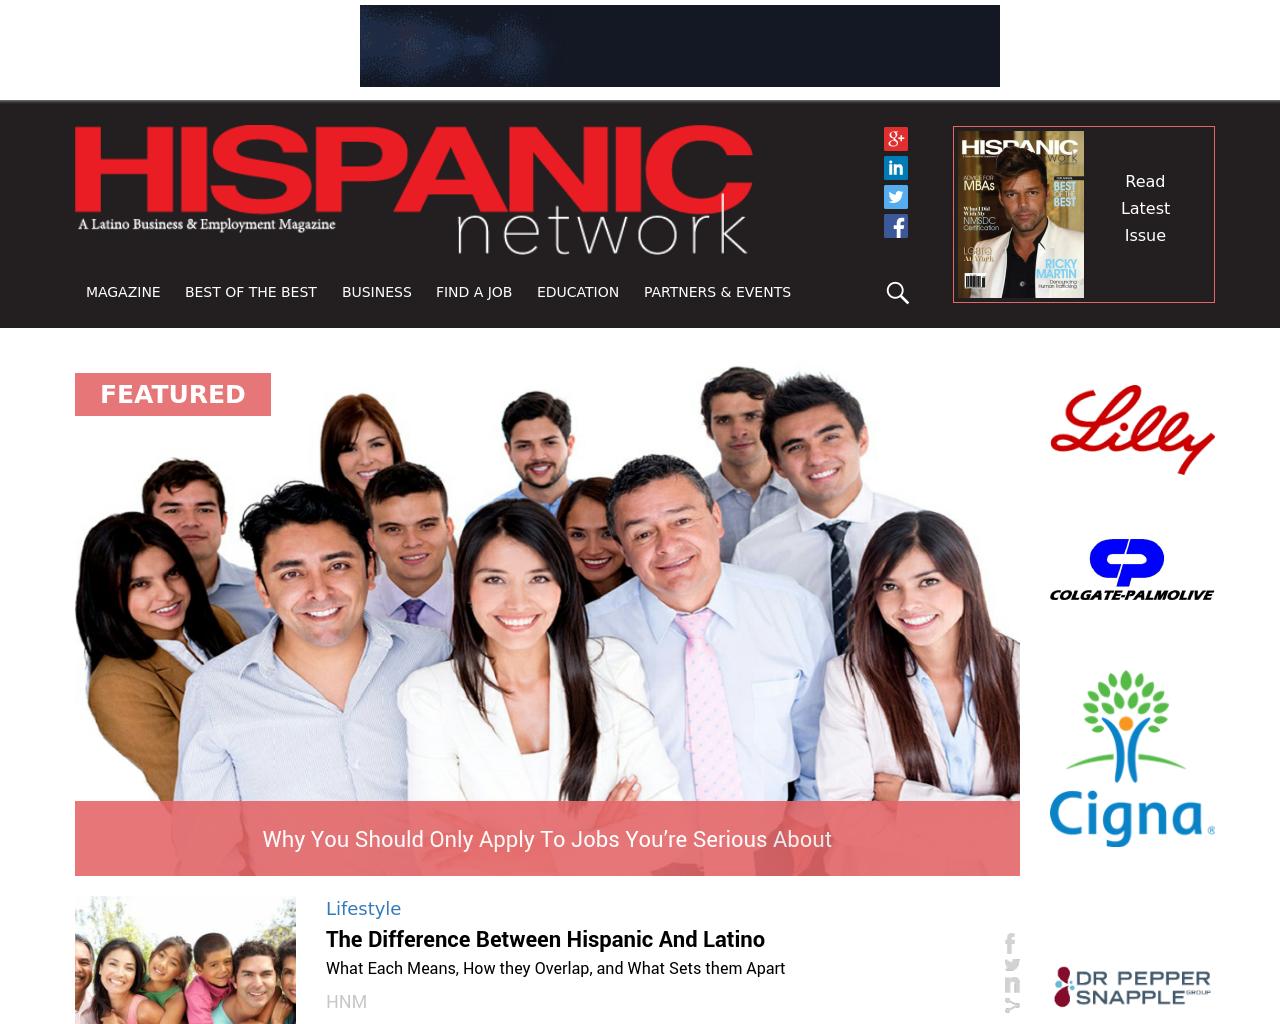 Hispanic-Network-Magazine-Advertising-Reviews-Pricing